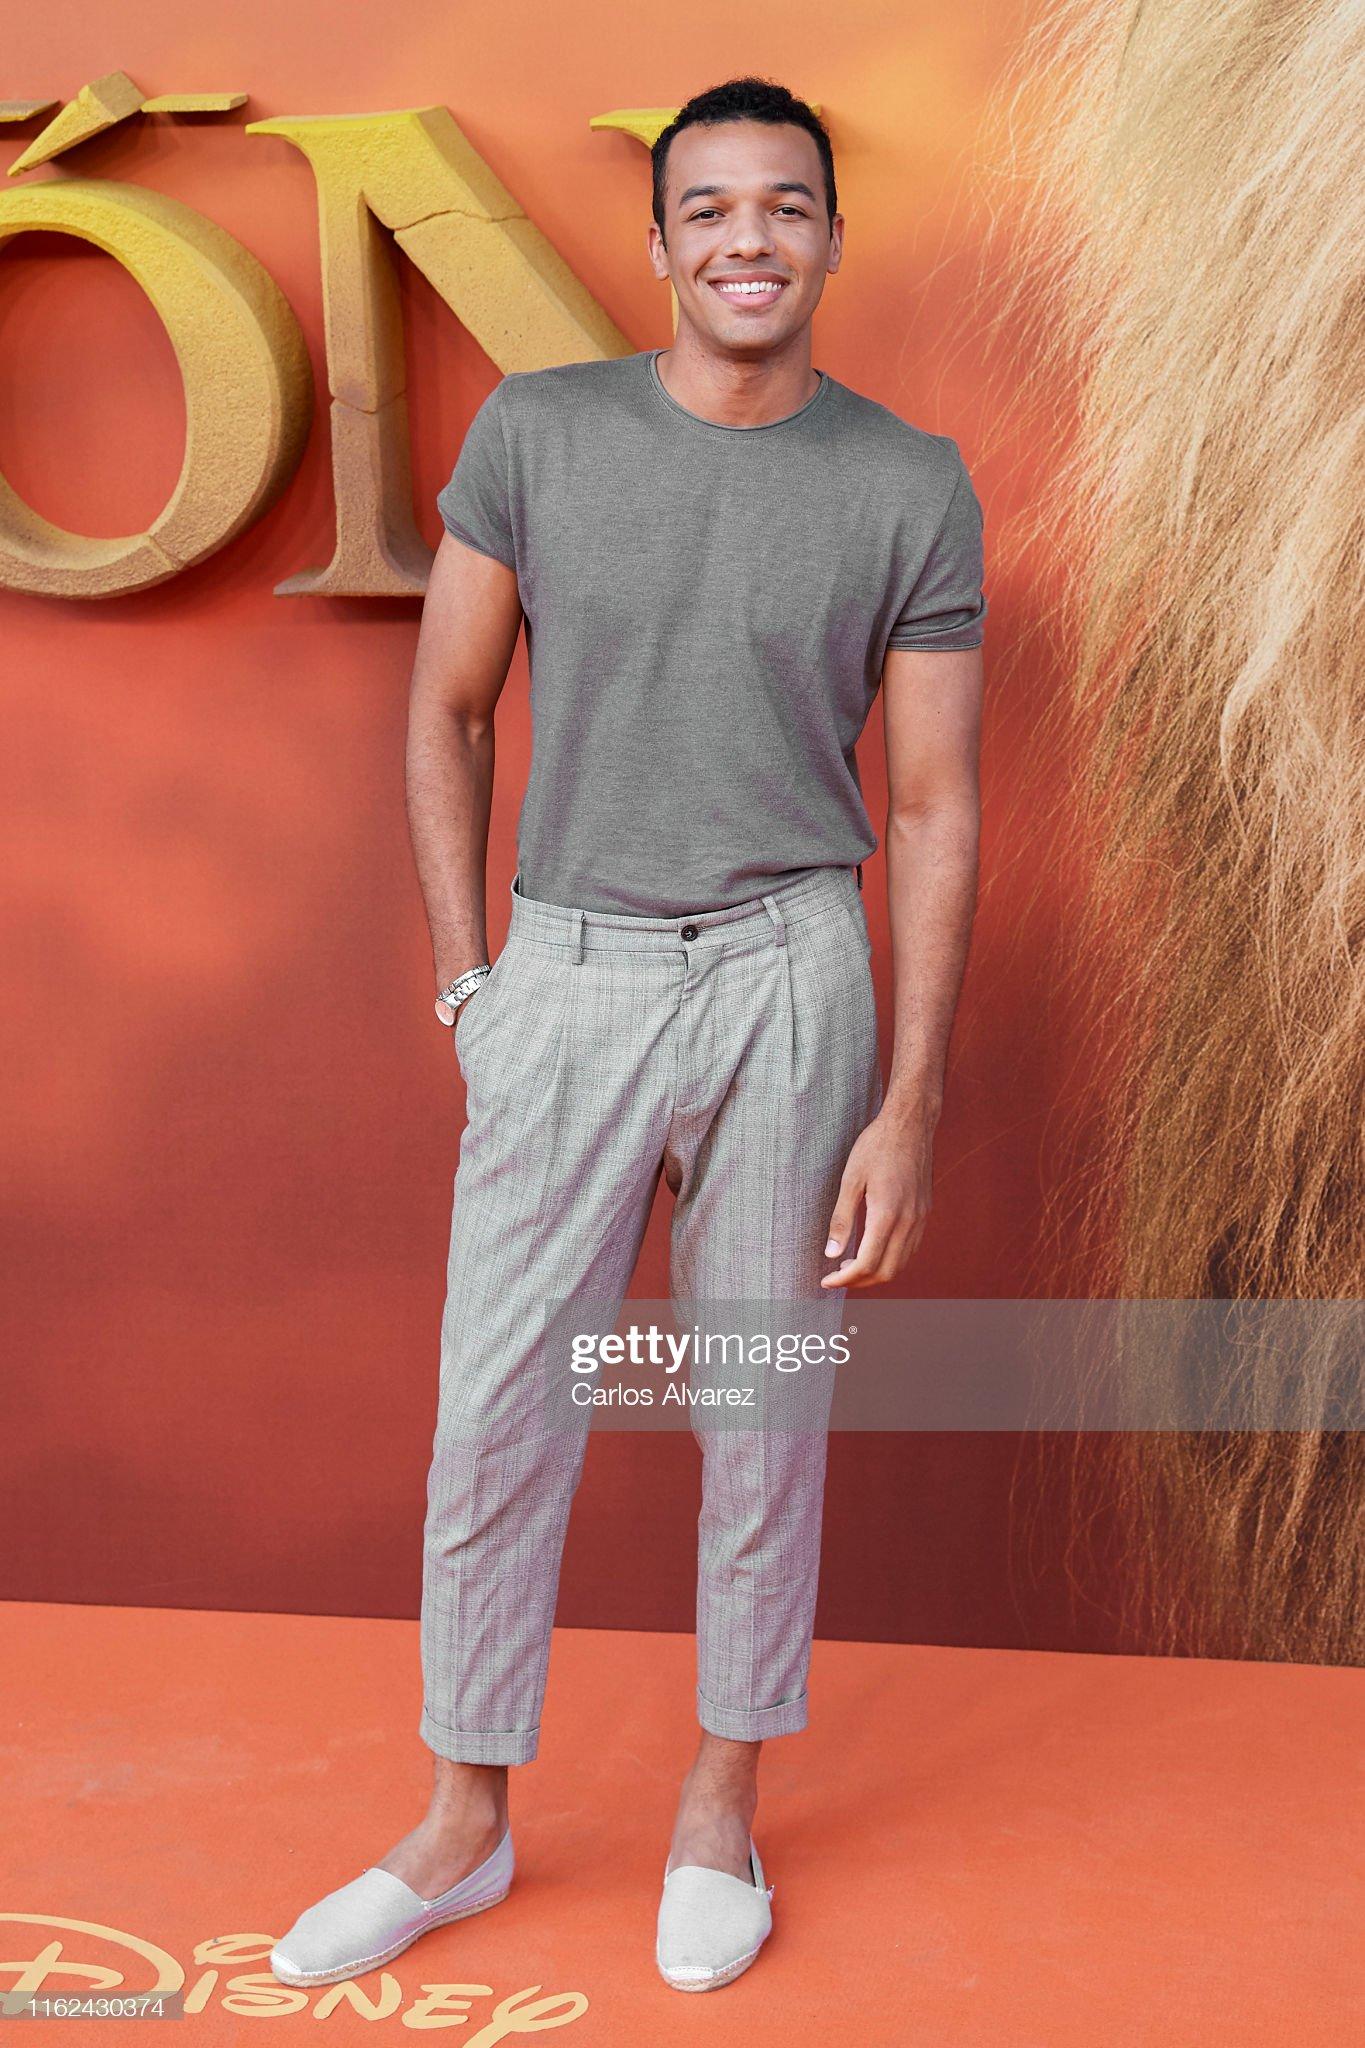 ¿Cuánto mide Sergio Momo? - Altura Sergio-momo-attends-el-rey-leon-premiere-at-the-goya-theater-on-july-picture-id1162430374?s=2048x2048